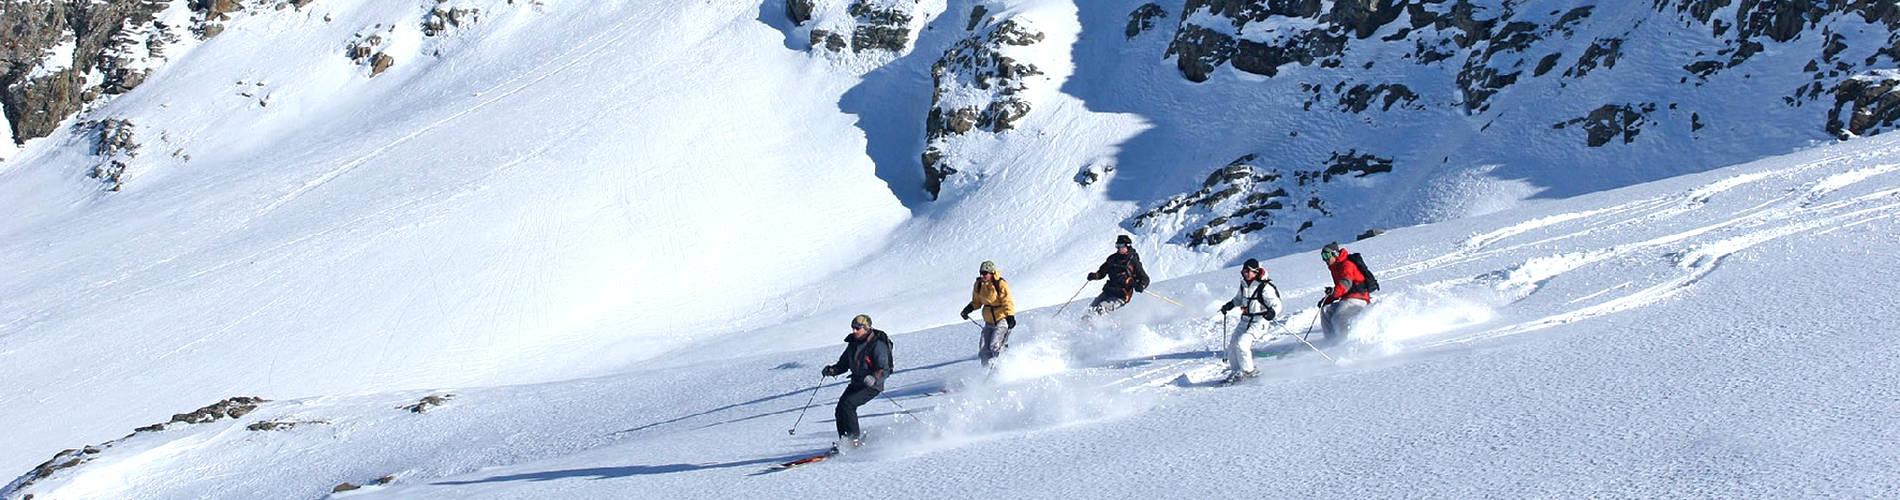 chalets_font_romeu_huttopia_activites_ski_descente